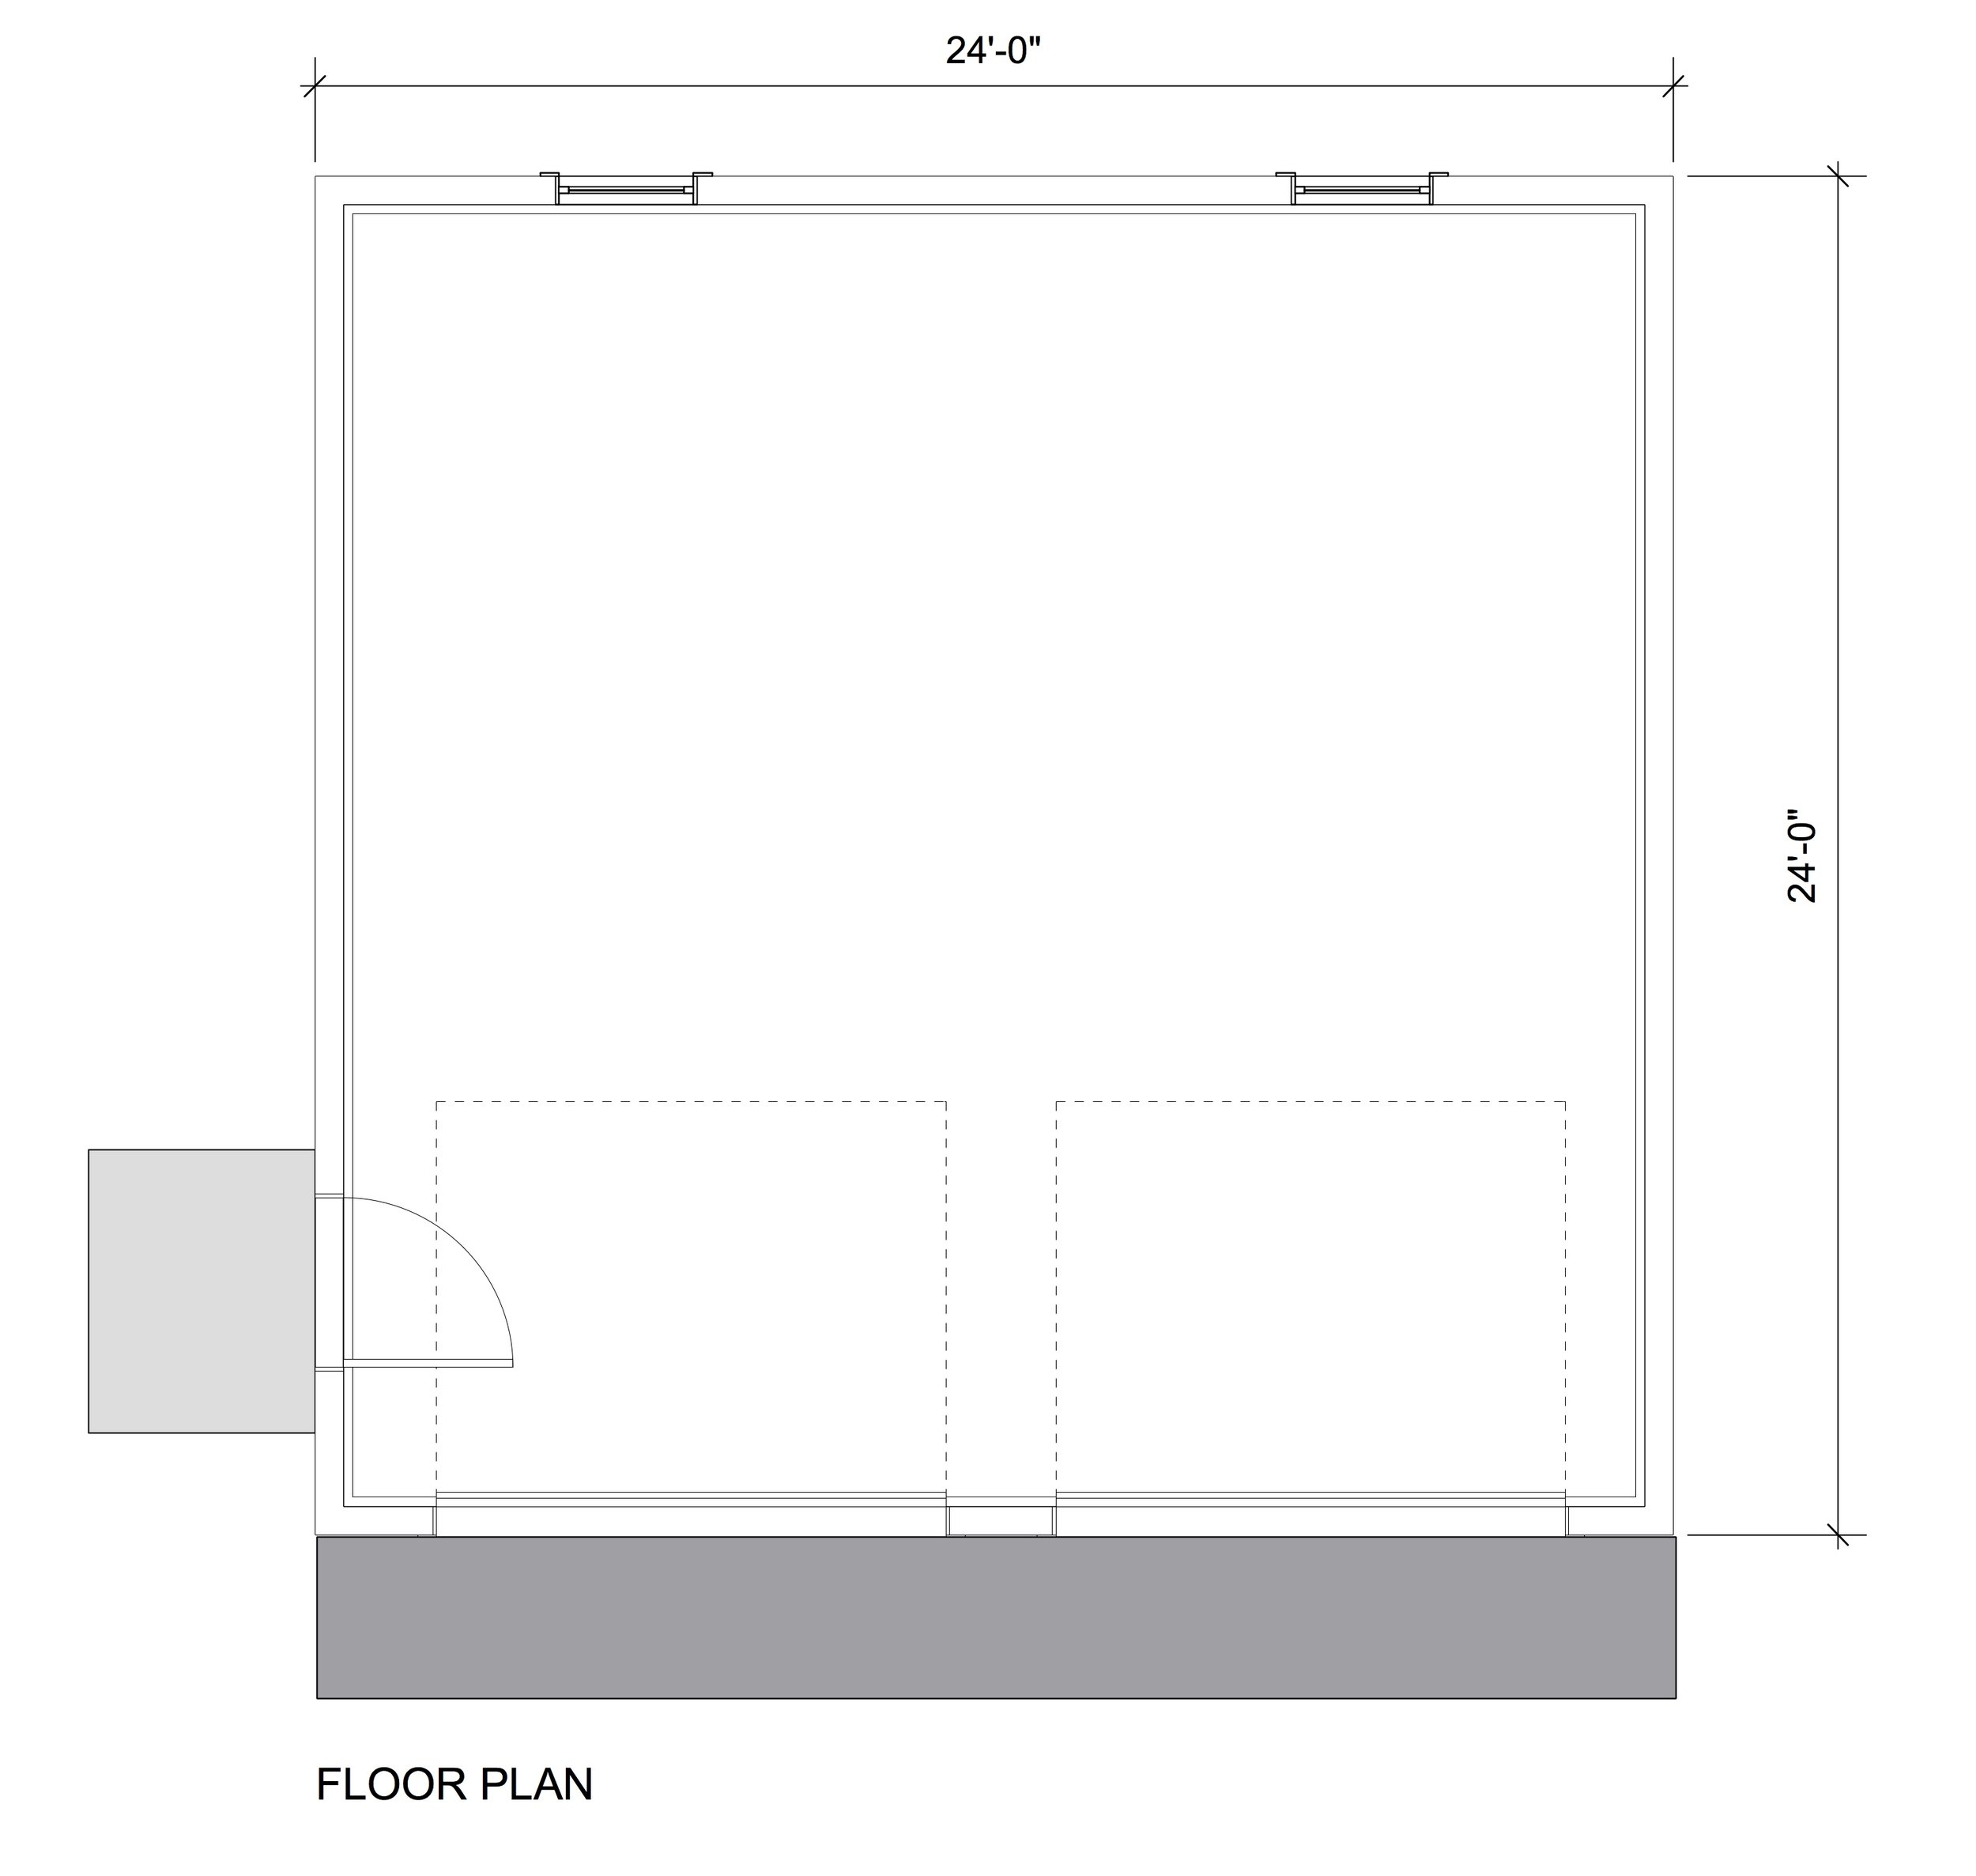 Garage Series G2 FLOOR PLAN.jpg